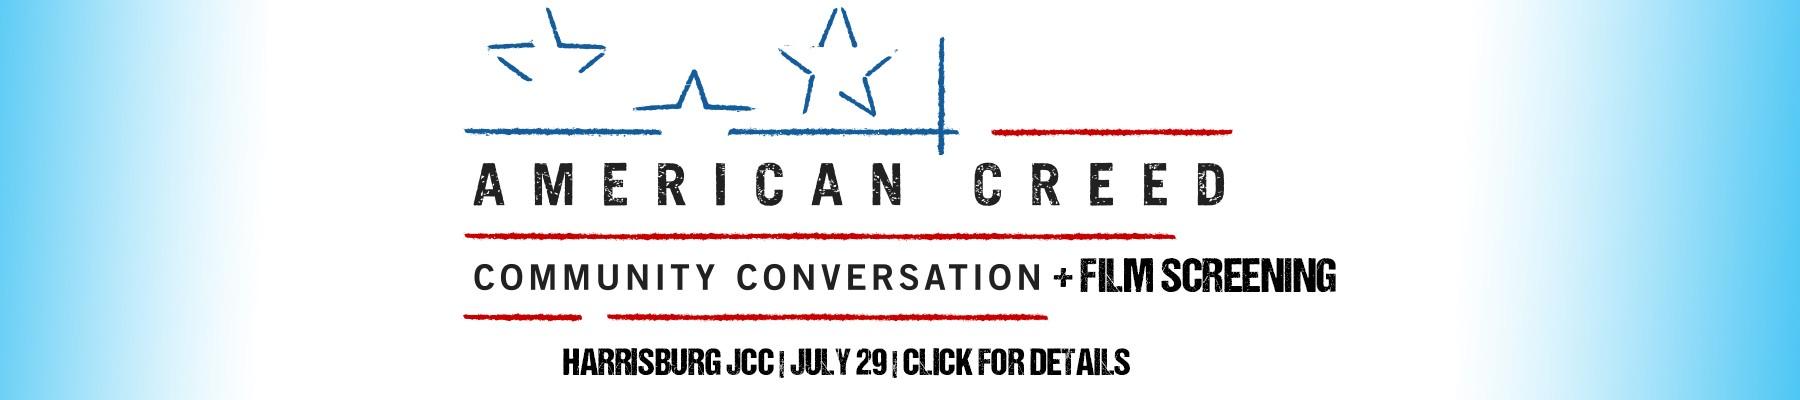 American Creed Slider.jpg